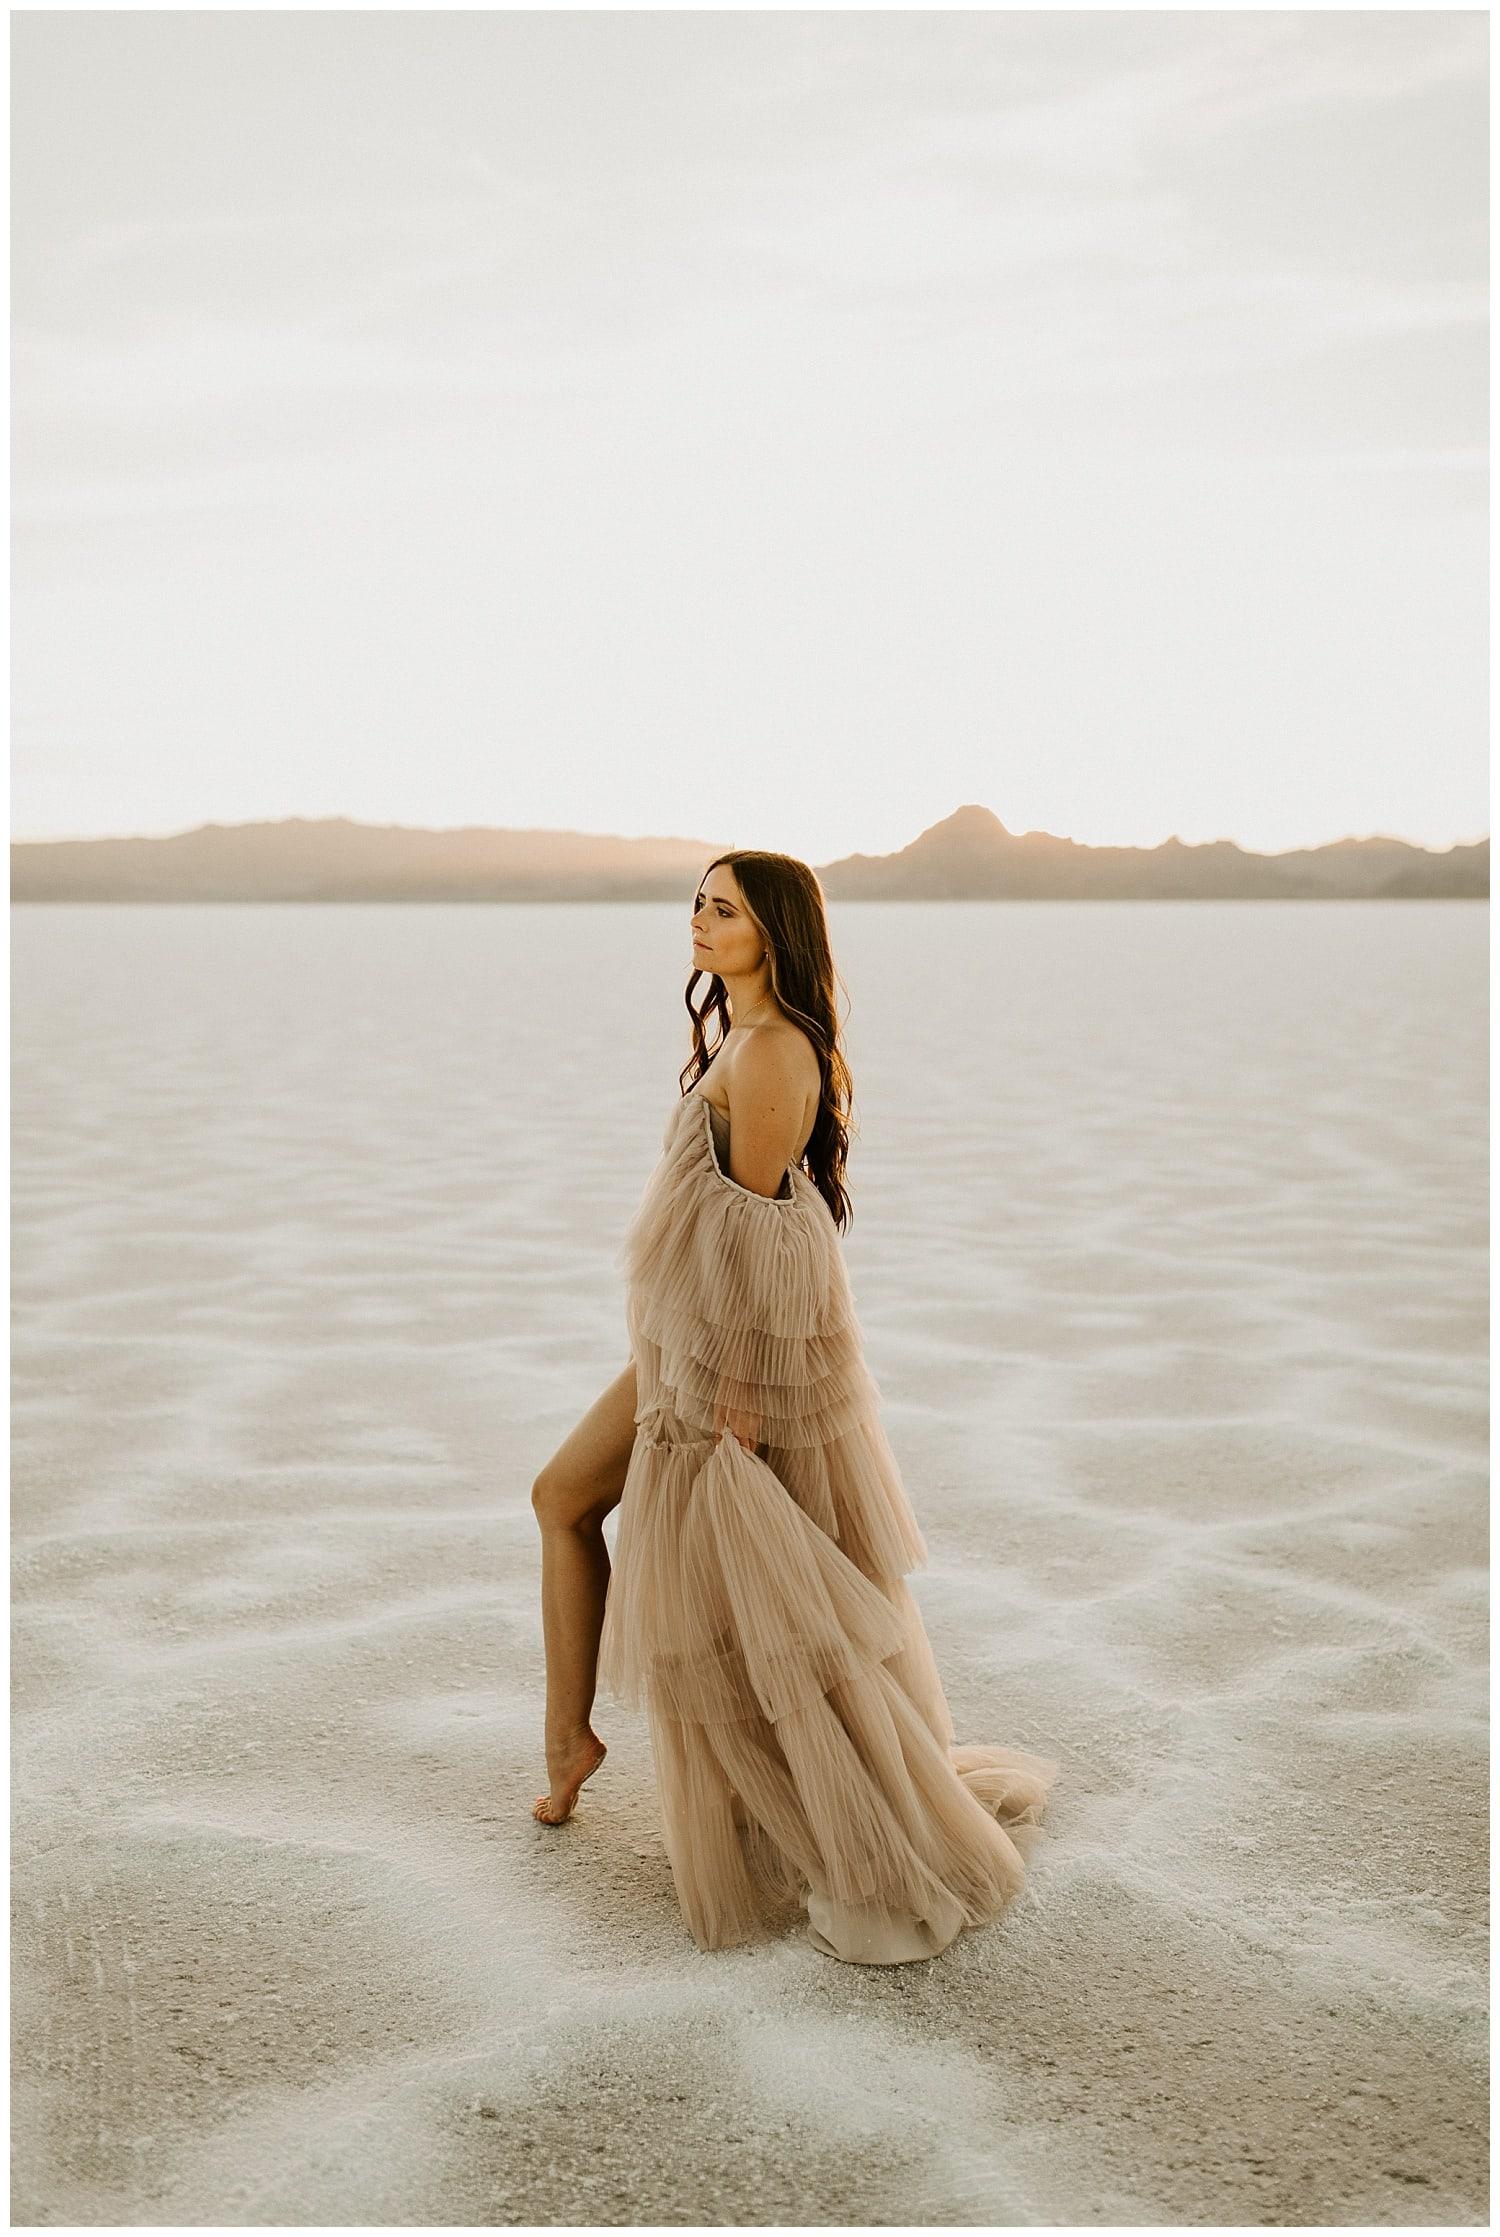 blush wedding dress, photography salt lake city, utah photographers, bonneville salt flats wedding